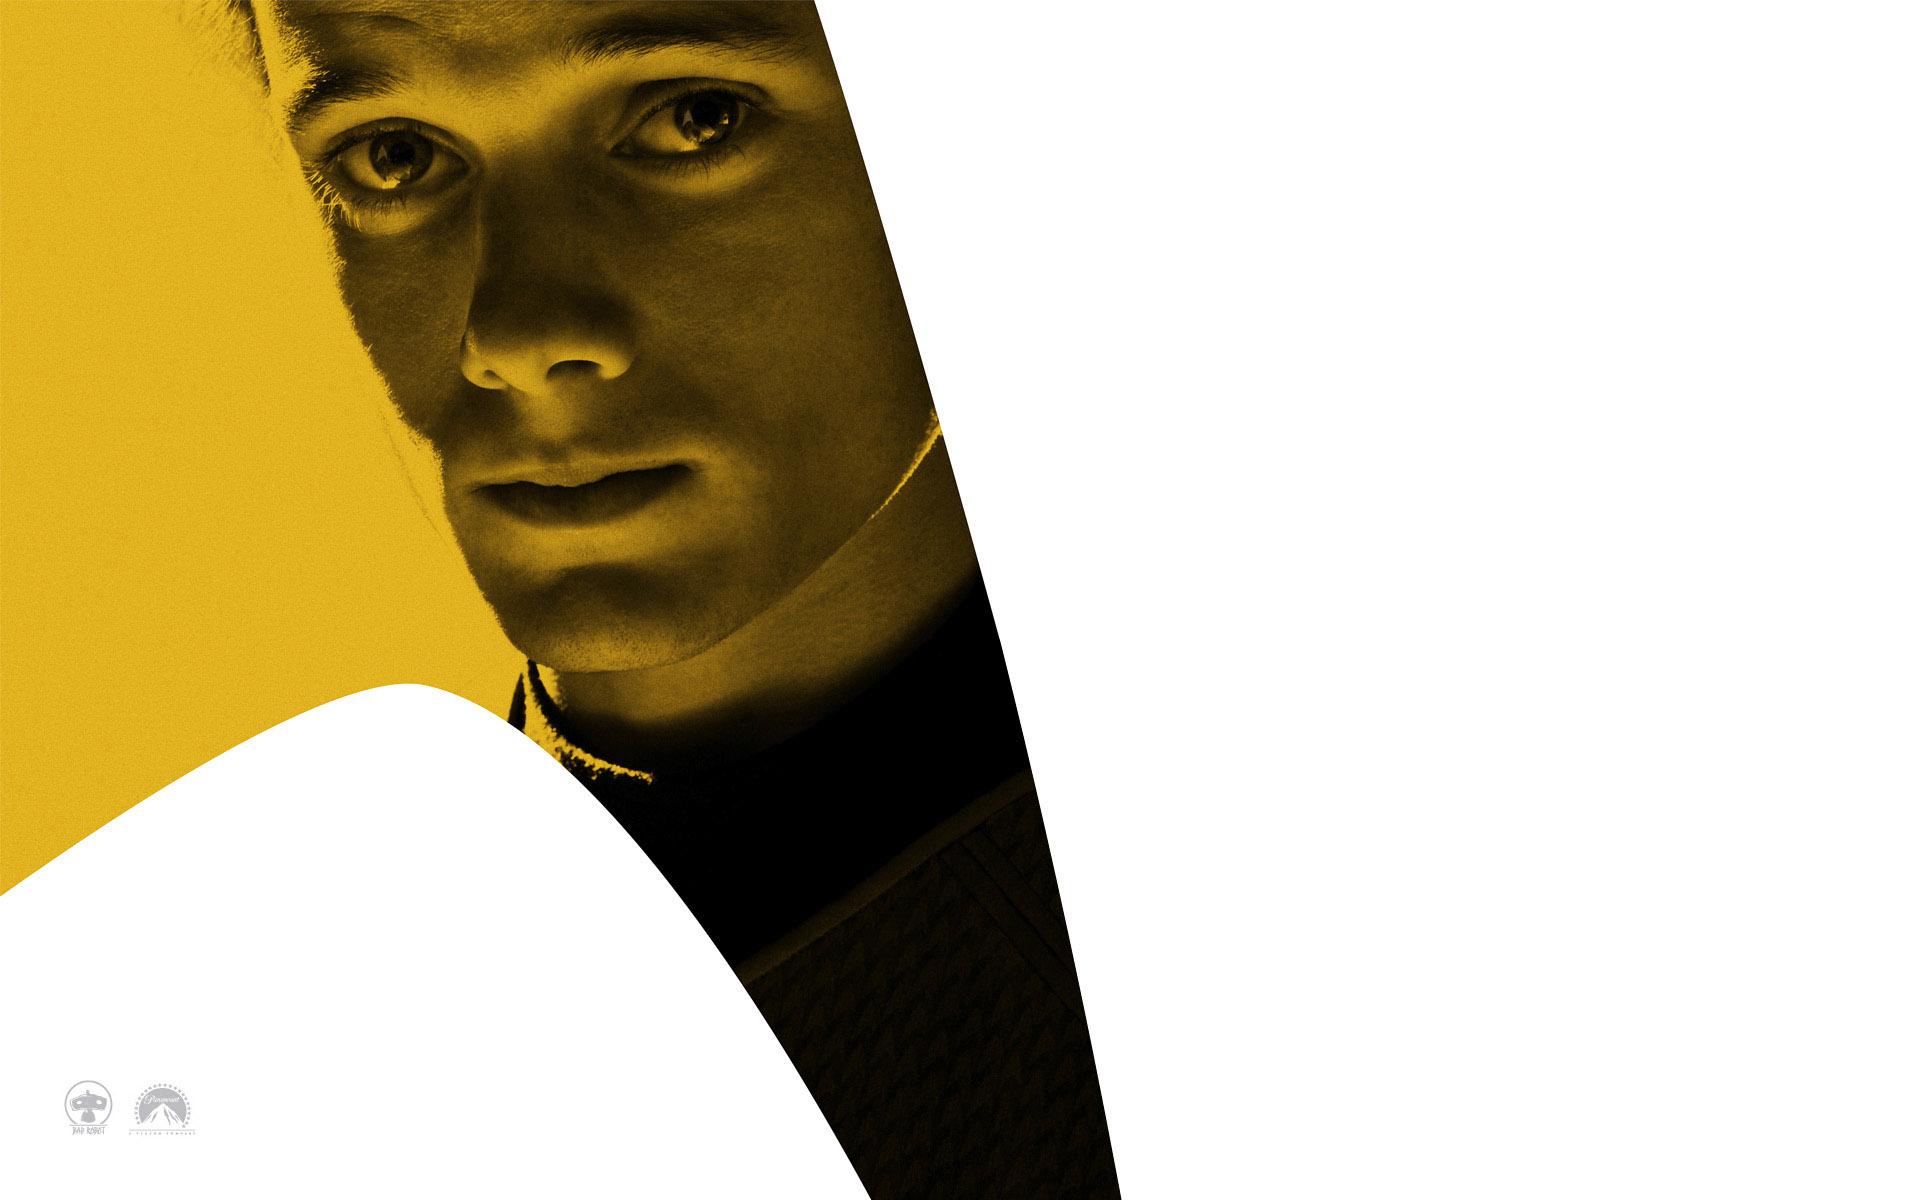 Wallpaper acteur Star Trek